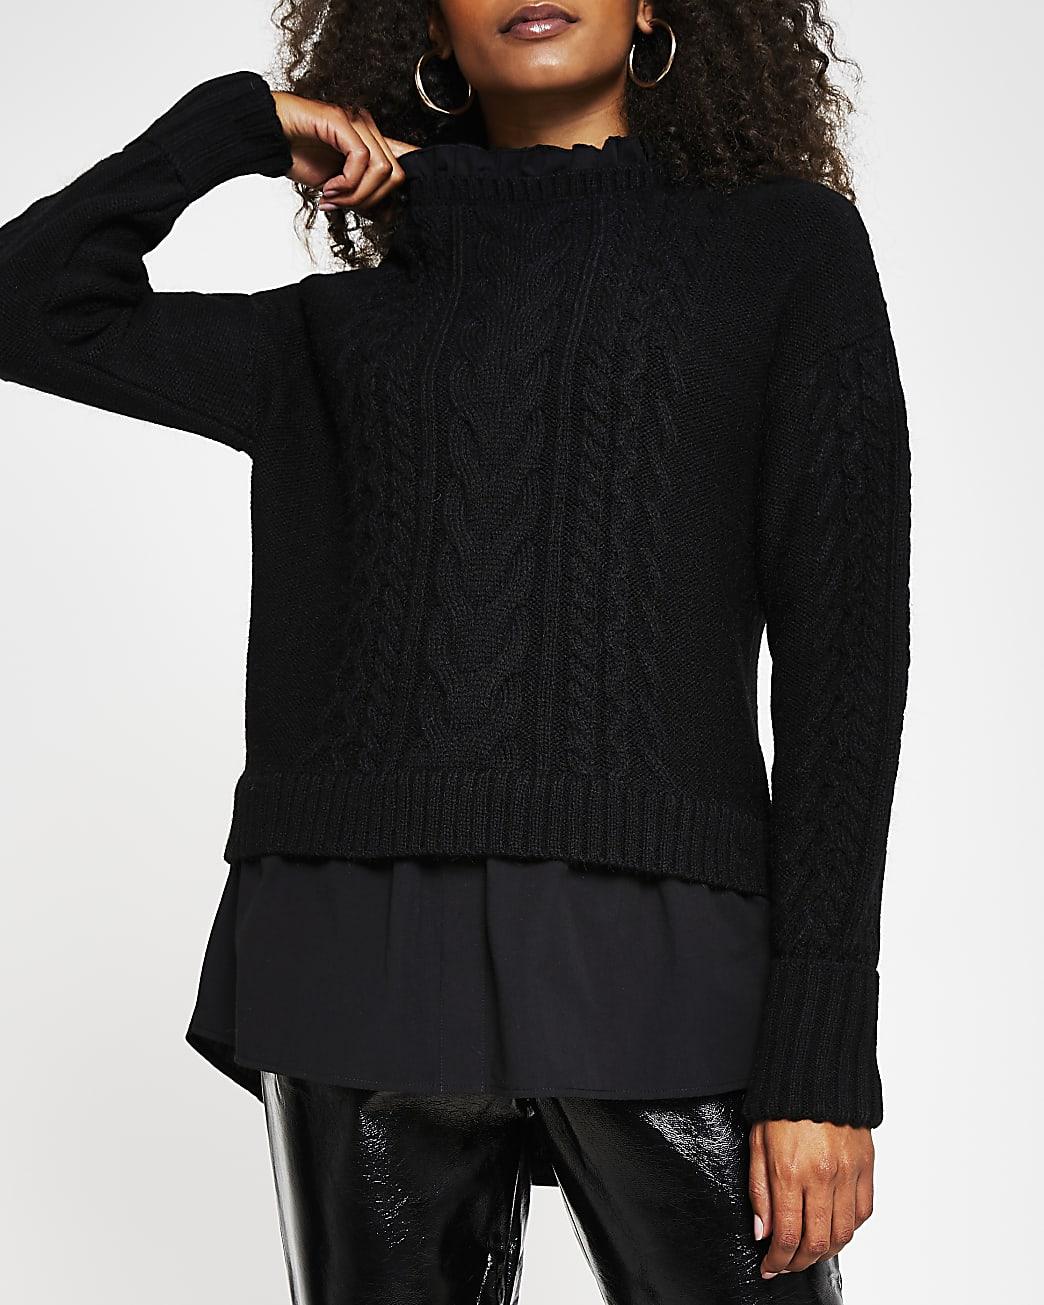 Black cable knit hybrid jumper